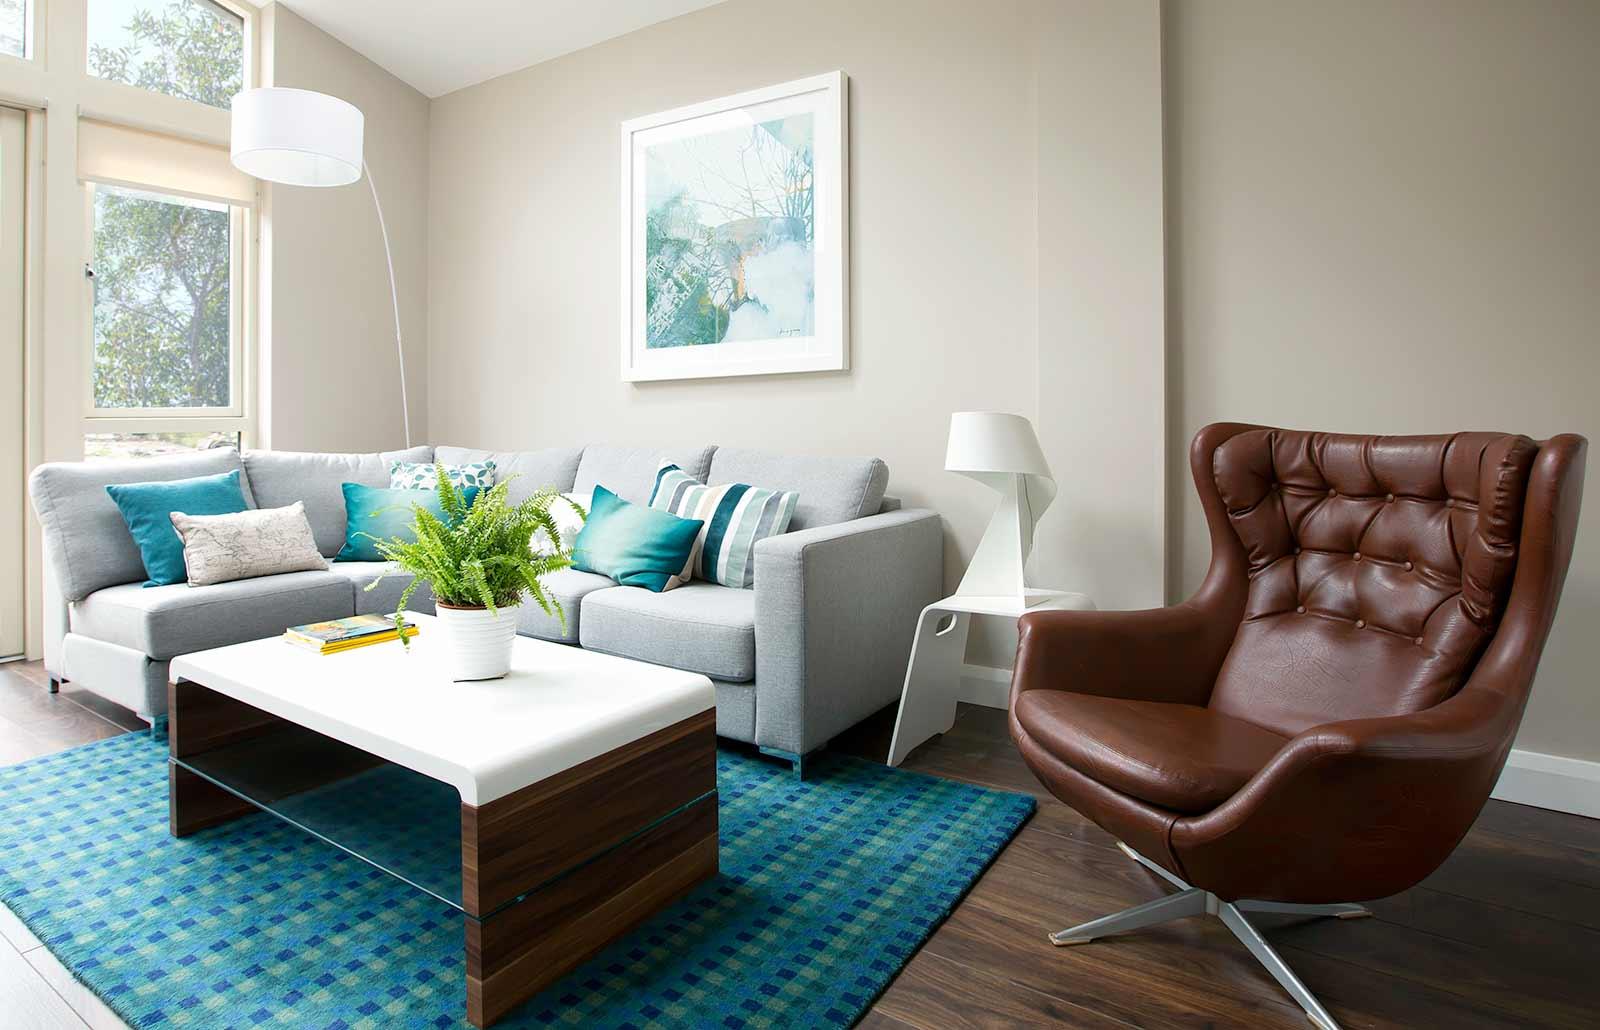 Carton-Interiors_P8_1_Open-plan-kitchen-living-room